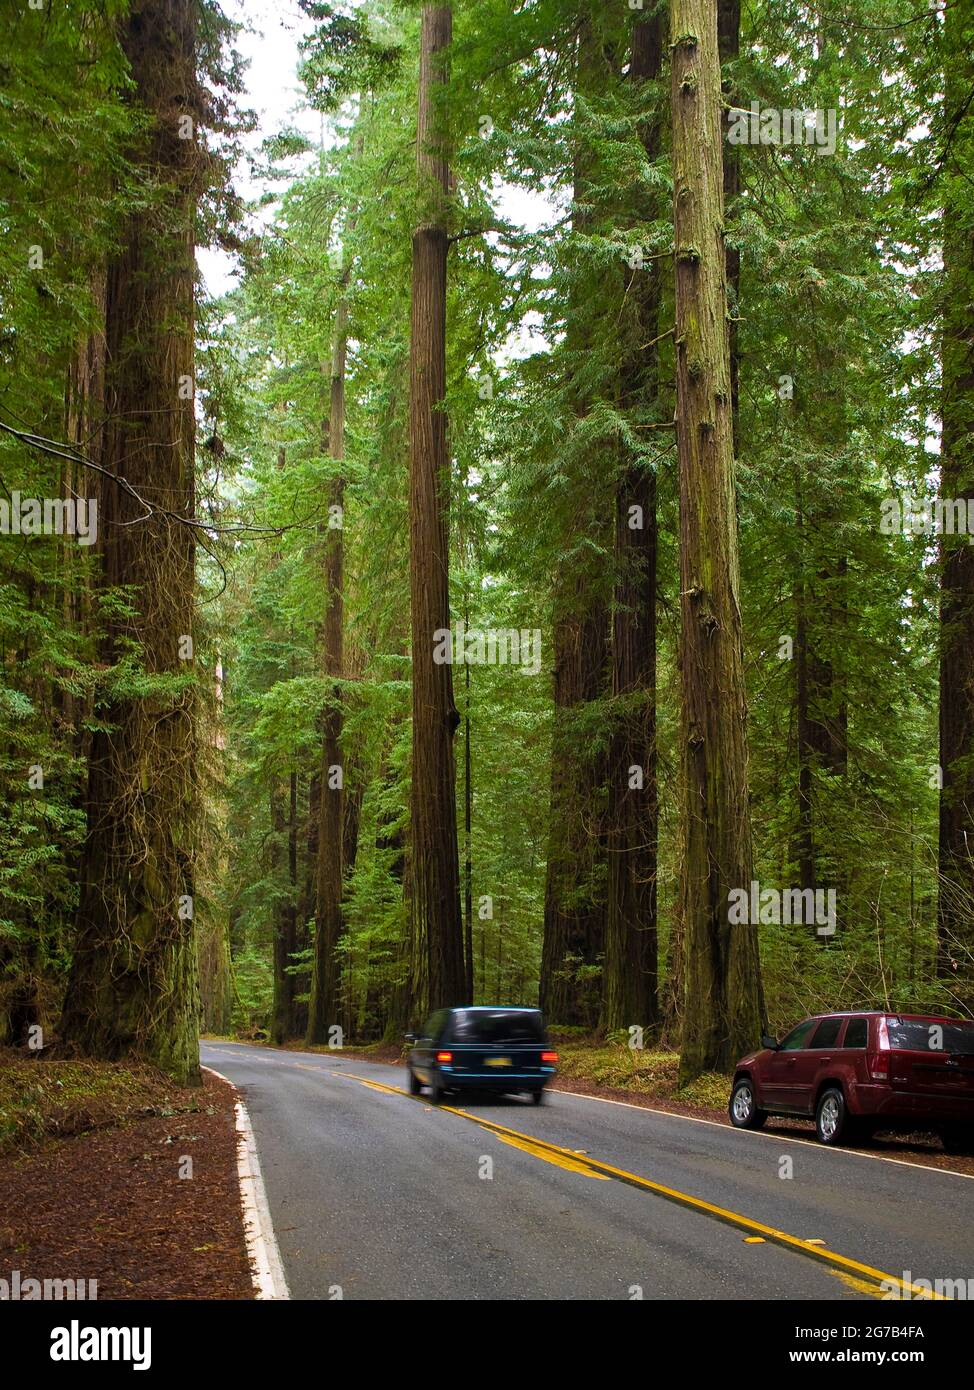 Avenue of the Giants, Humboldt Redwoods state Park, California, Stati Uniti Foto Stock